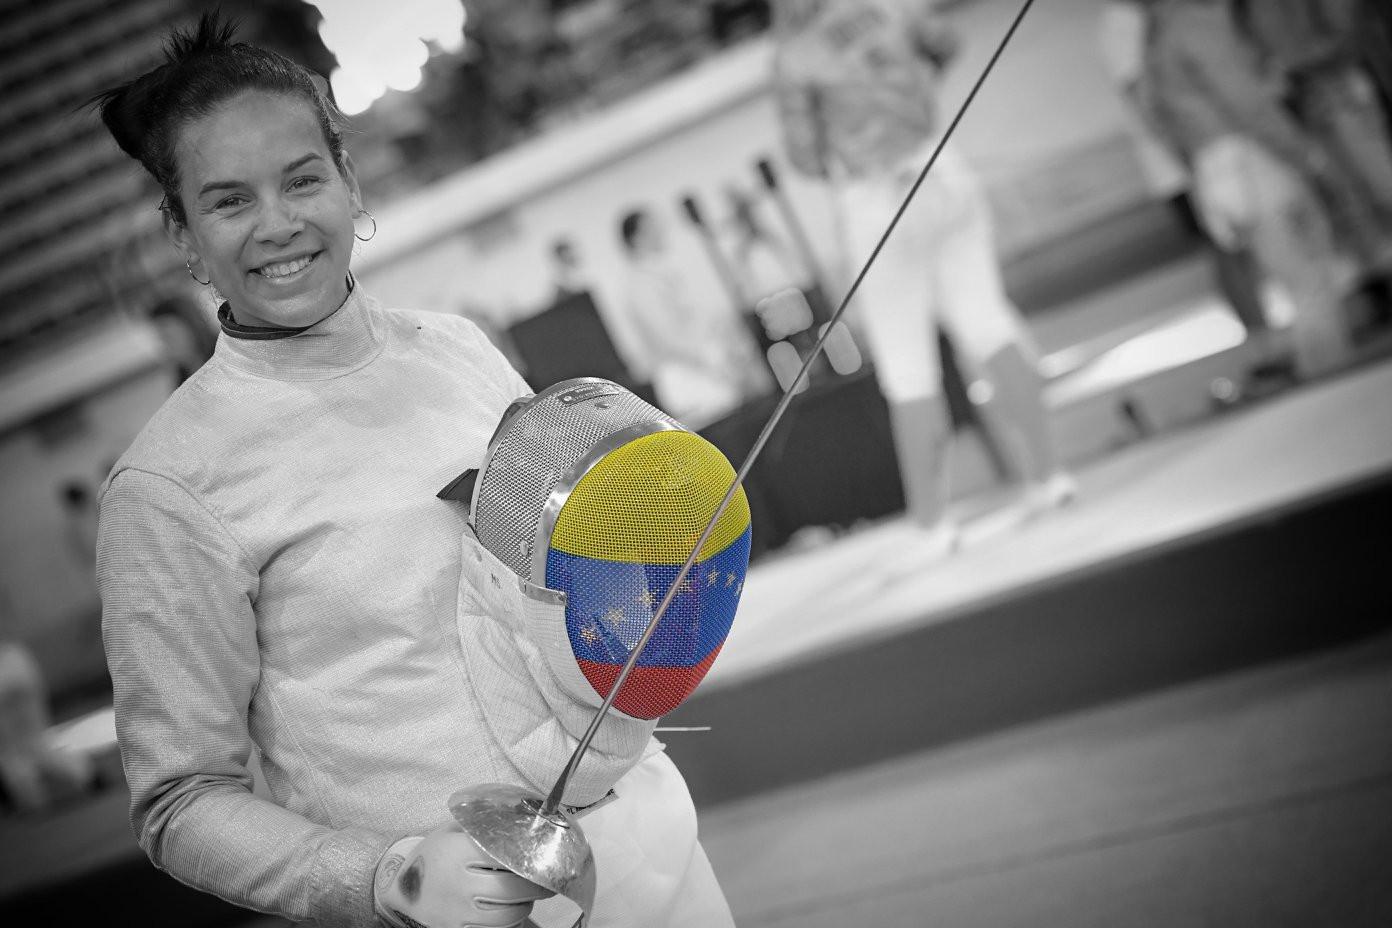 Venezuelan earns meeting with top seed Kharlan at FIE Sabre World Cup